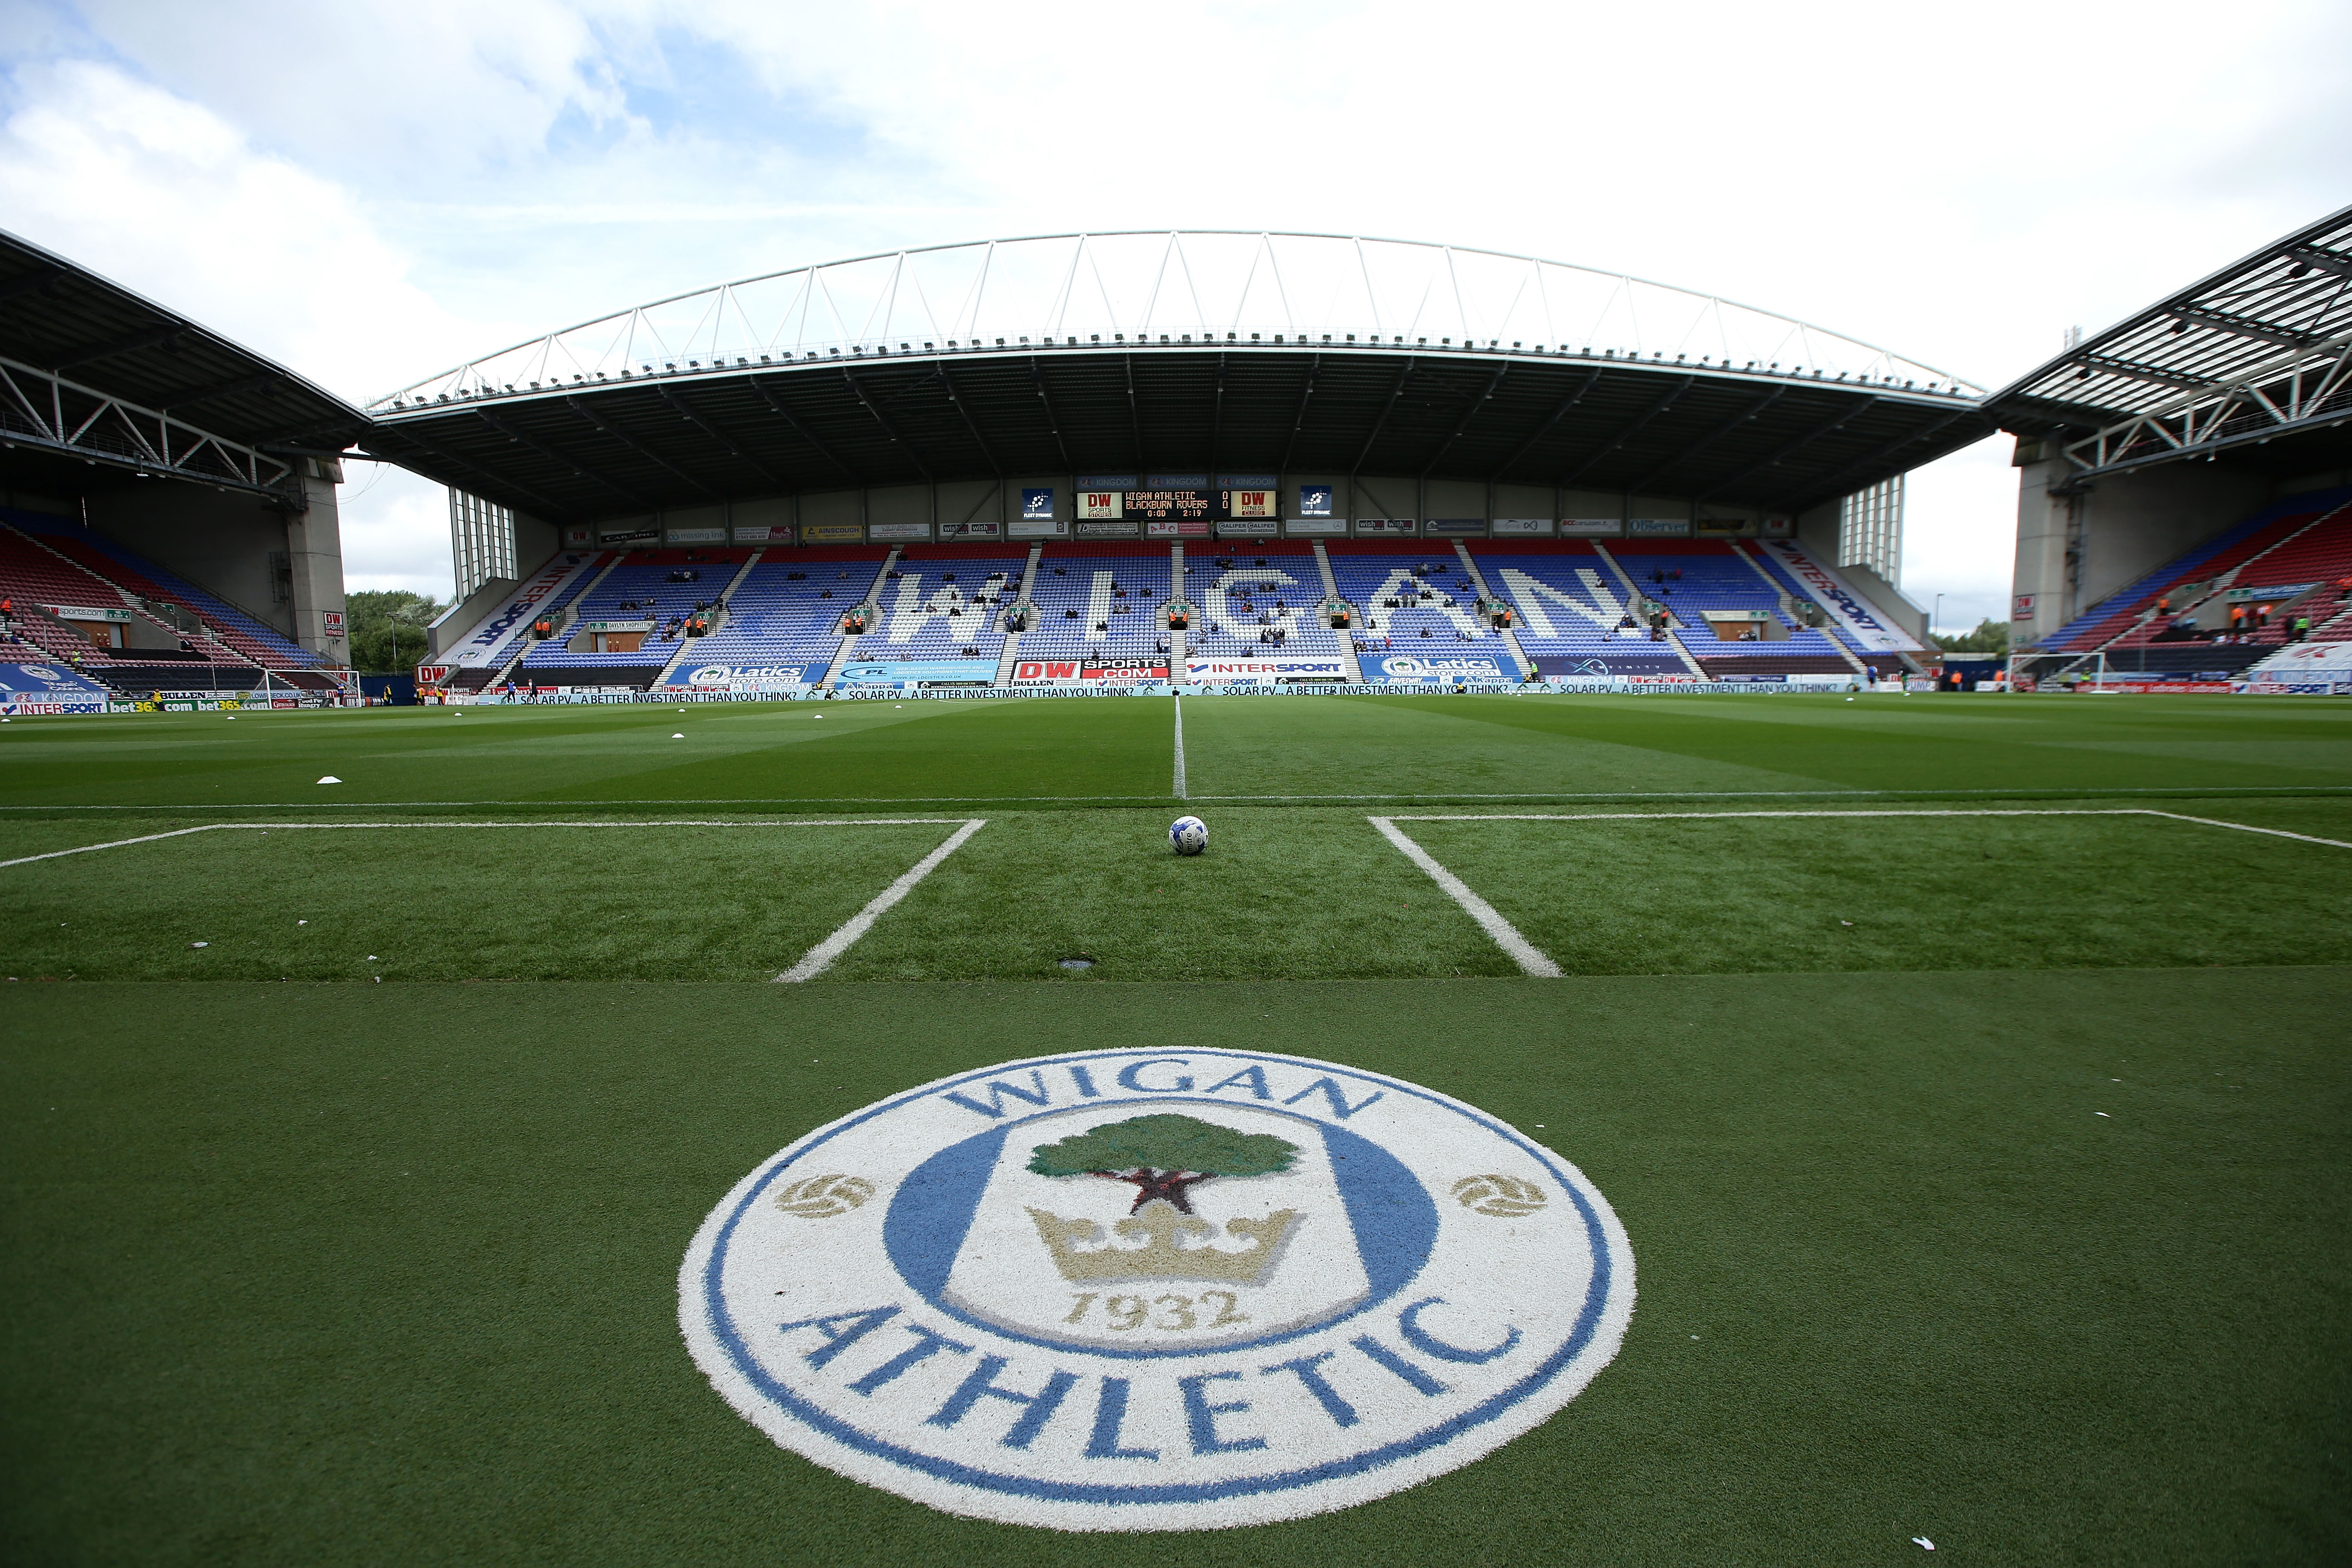 Wigan Athletic v Blackburn Rovers: Sky Bet Championship League